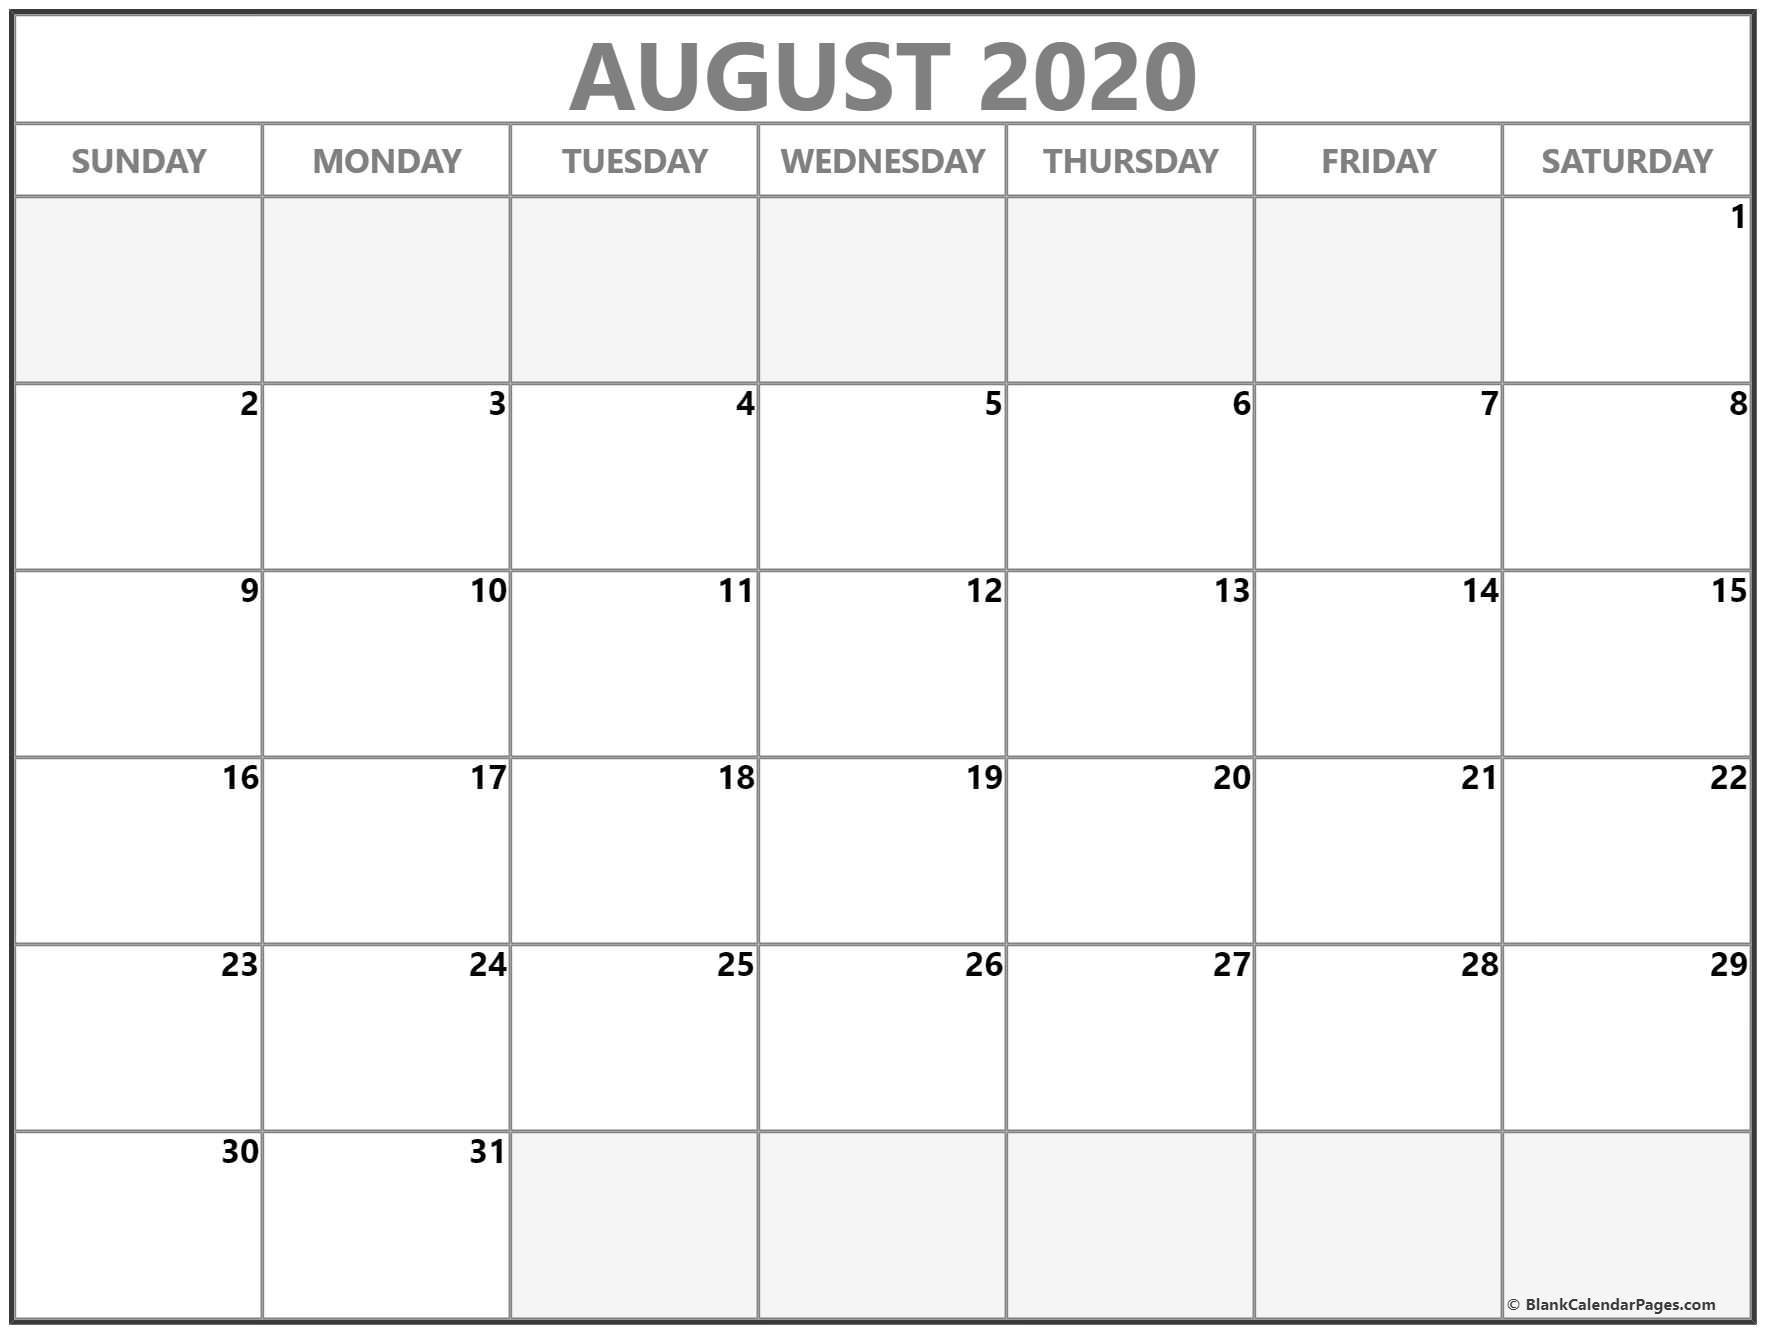 August 2020 Calendar | Free Printable Monthly Calendars-August 2020 Colorful Calendar Template